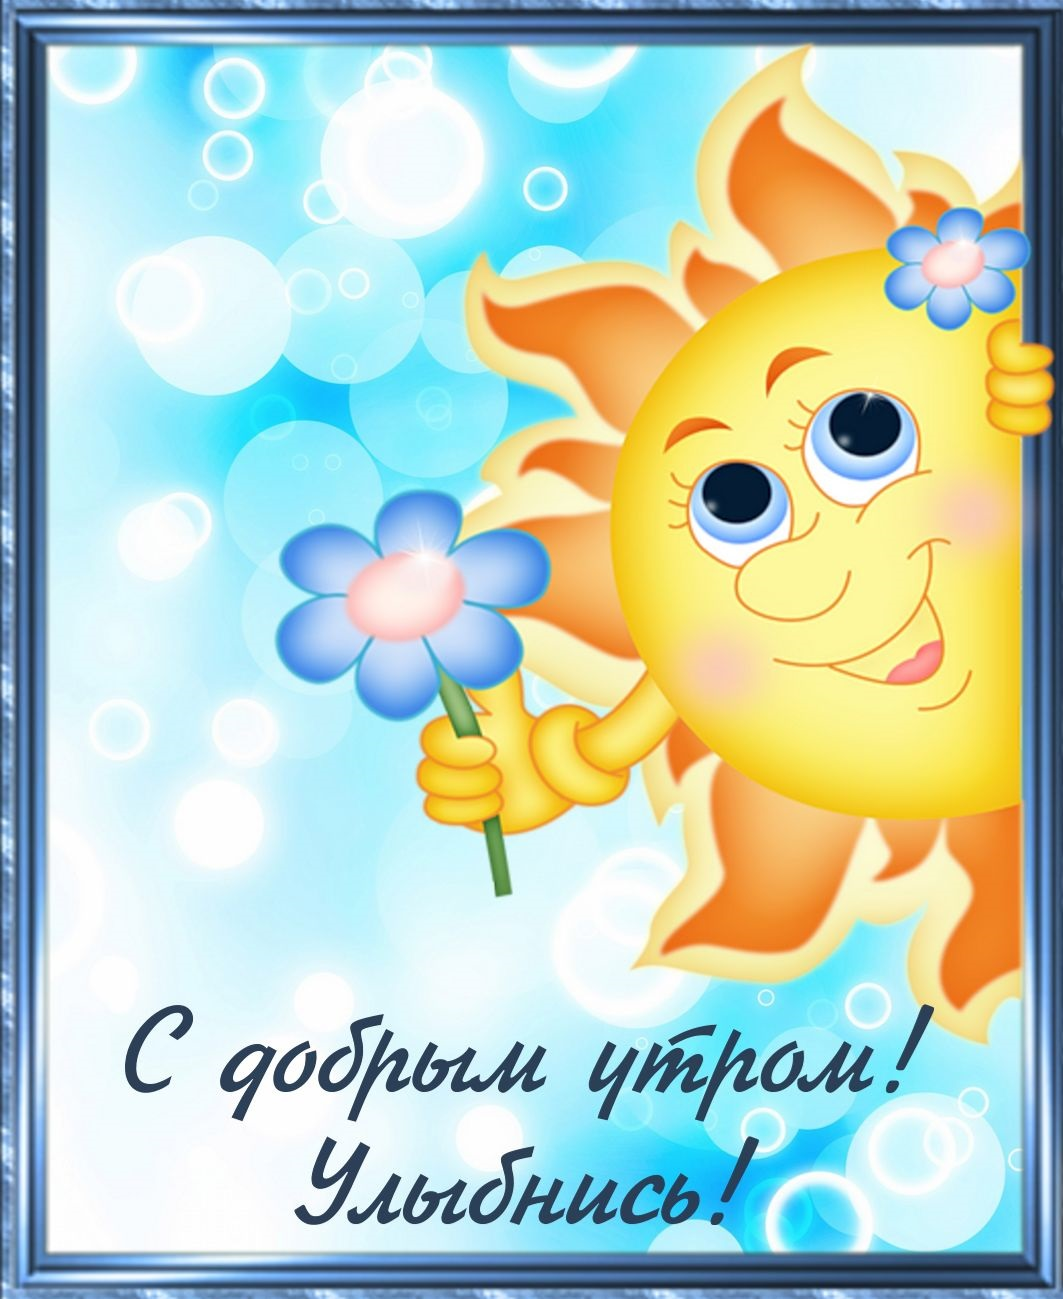 Картинки с добрым утром и позитивом